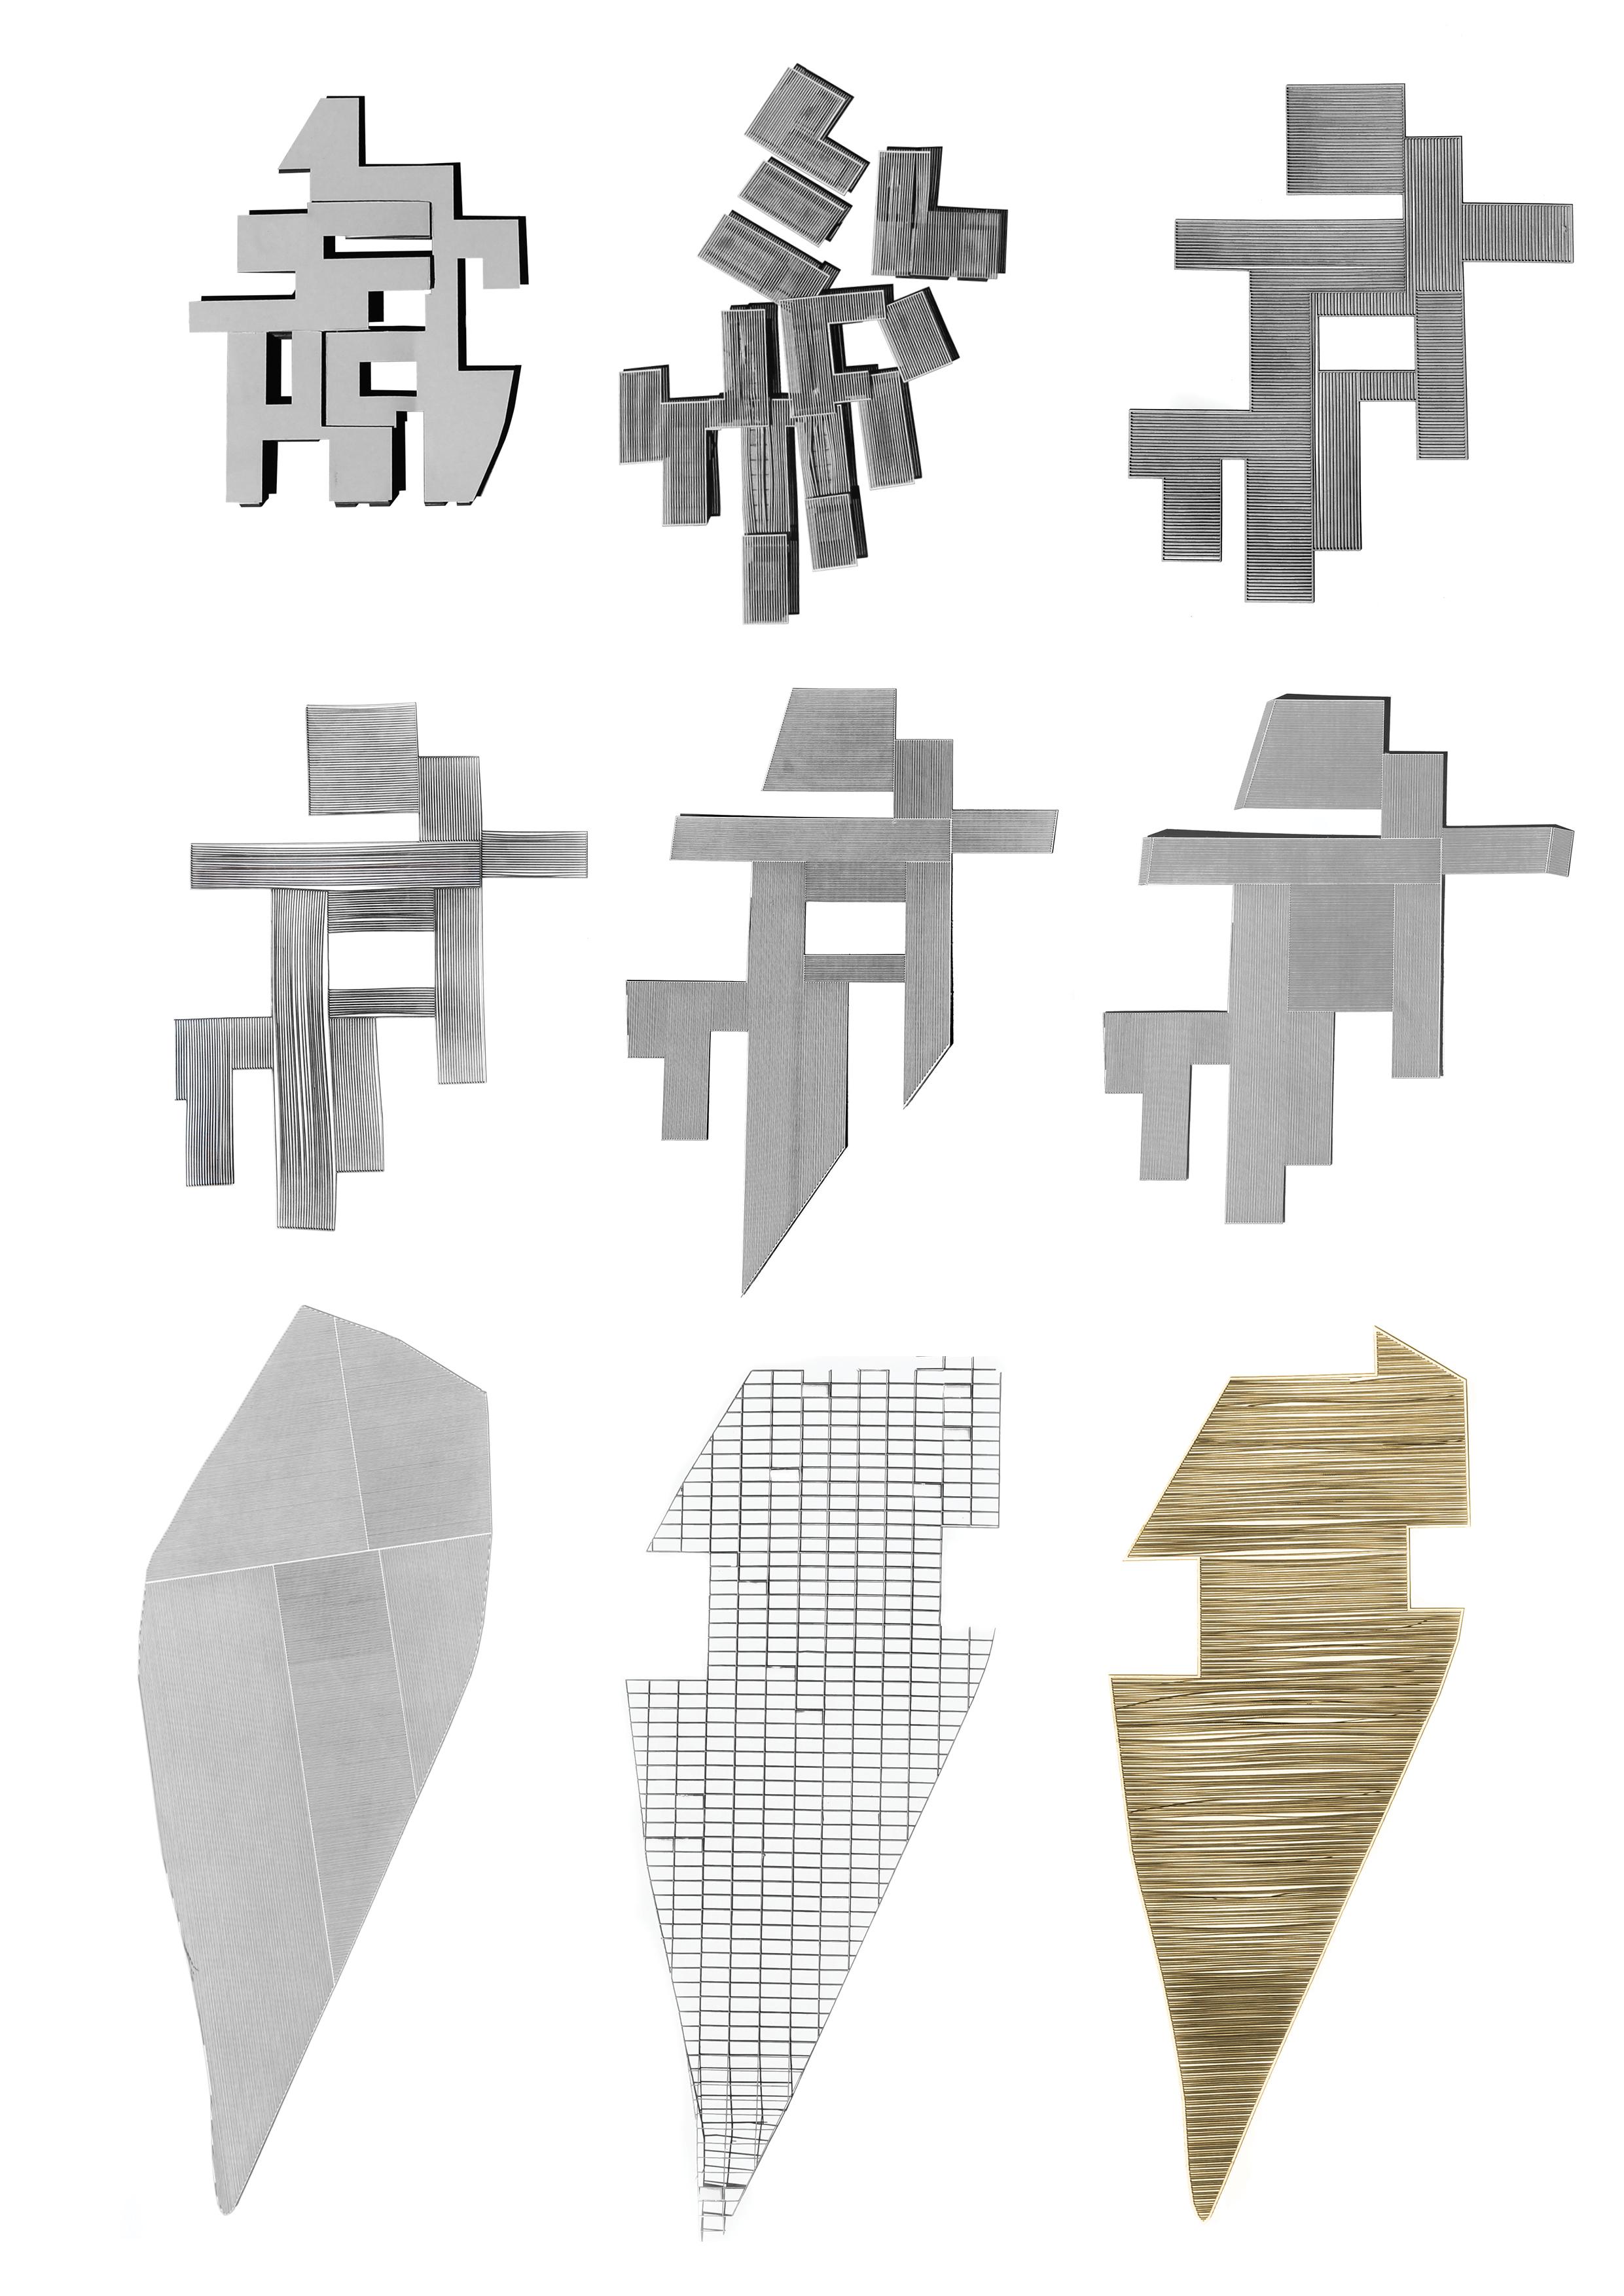 LL_1-1000-Models_Canopy Formal Studies.jpg